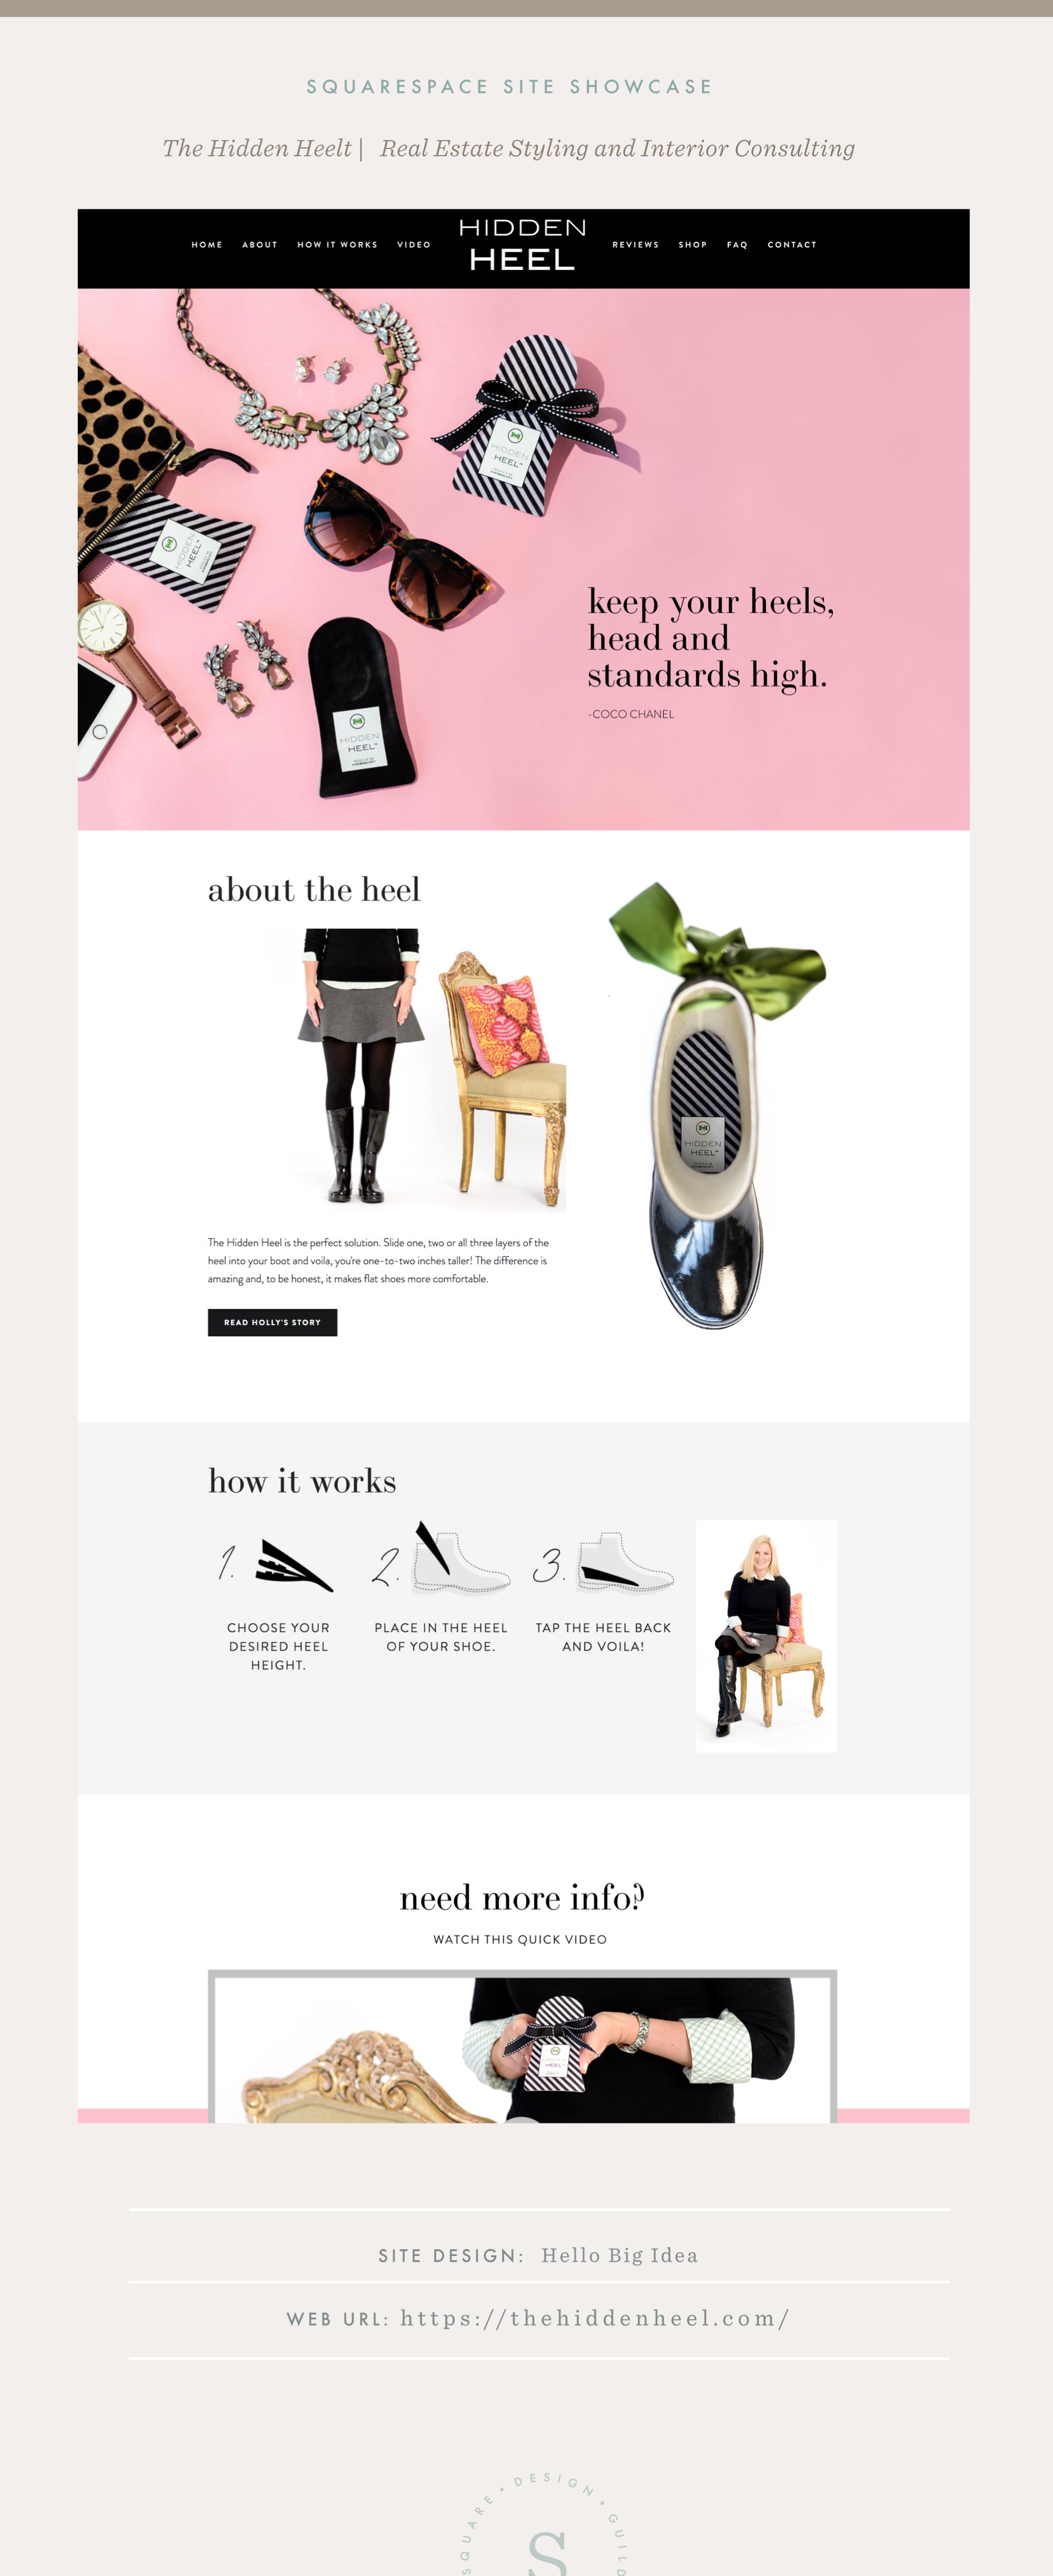 Squarespace Site Showcase   Hello Big Idea   The Hidden Heel   Pacific Template